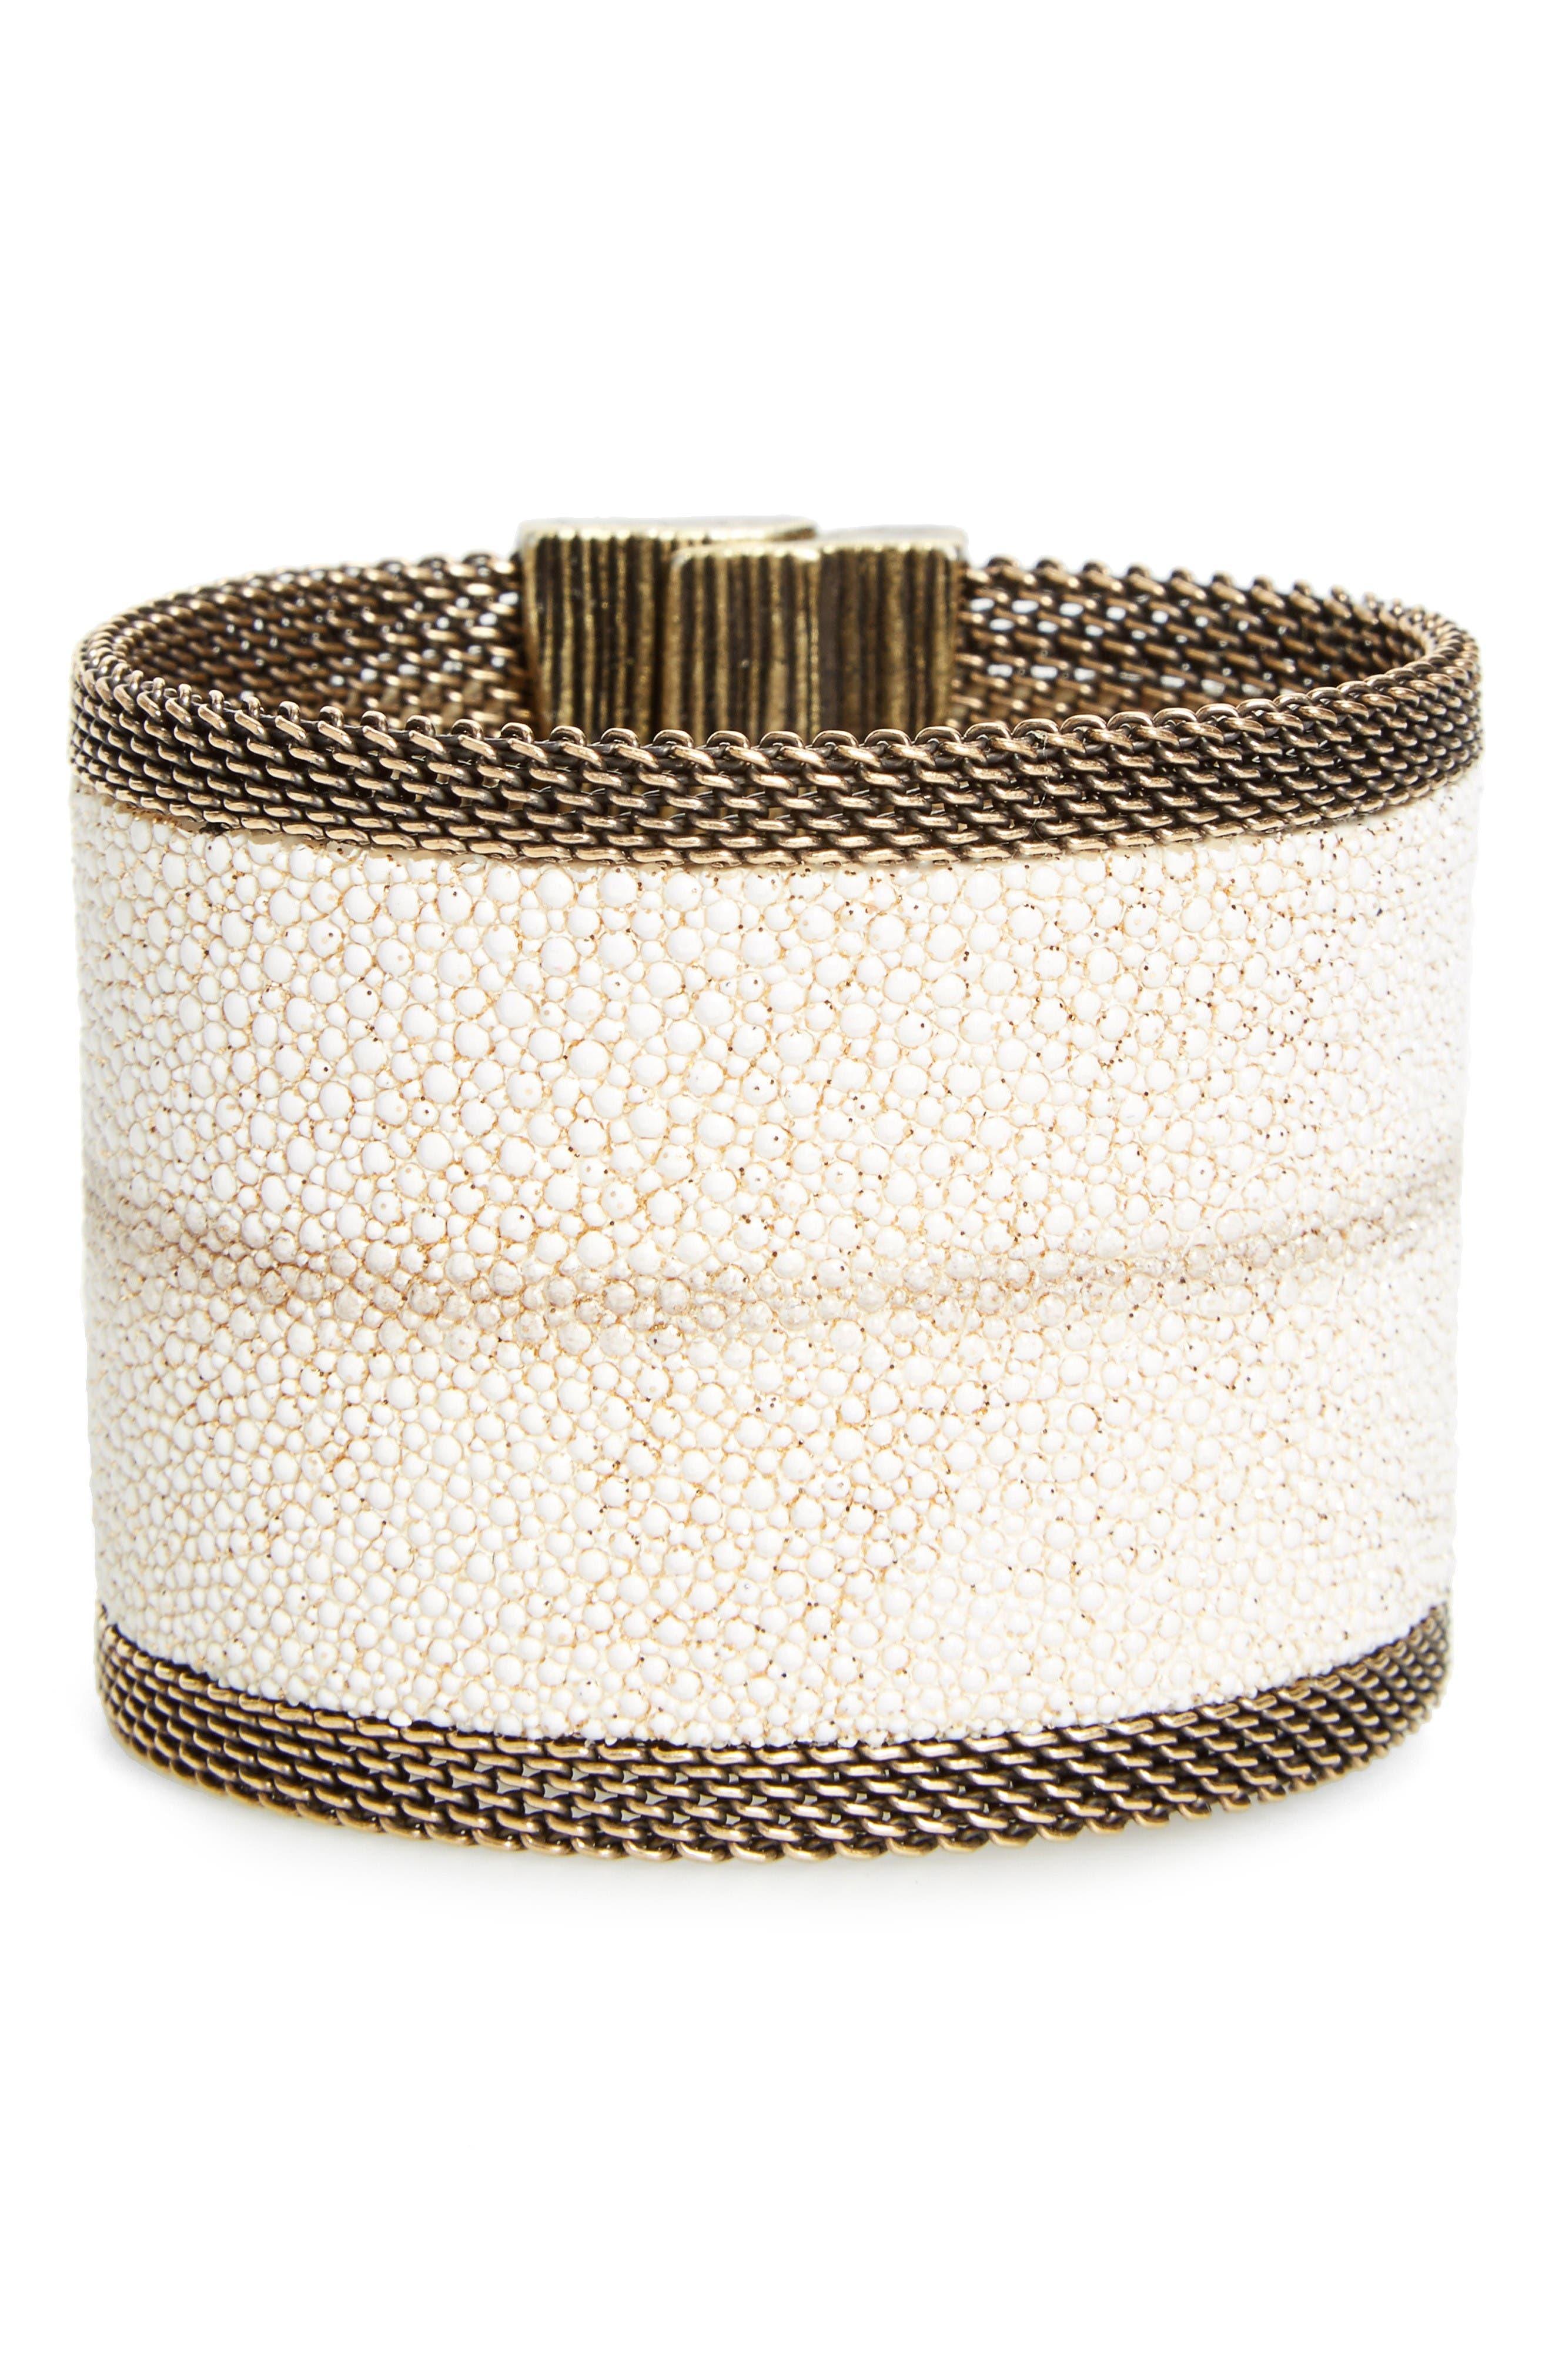 Main Image - Cynthia Desser Genuine Stingray Skin Bracelet